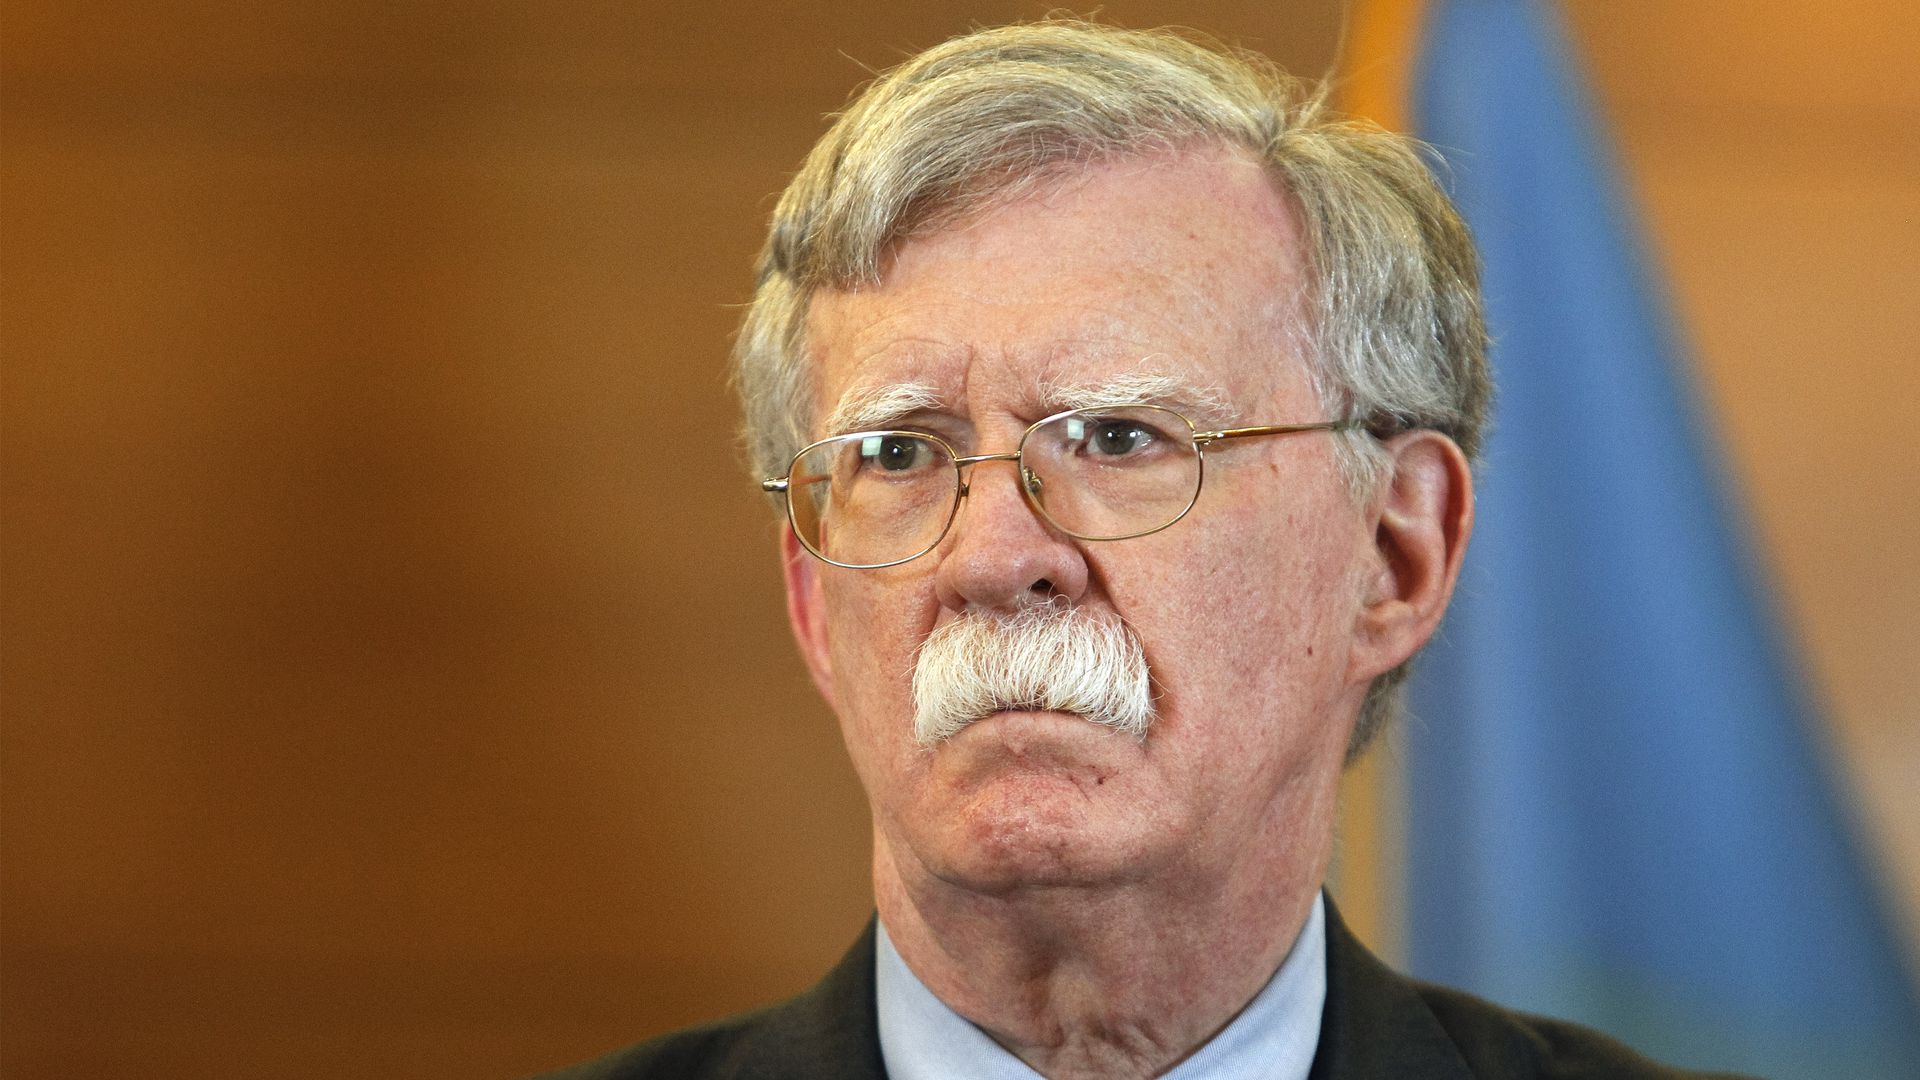 John Bolton in front of a Ukrainian flag